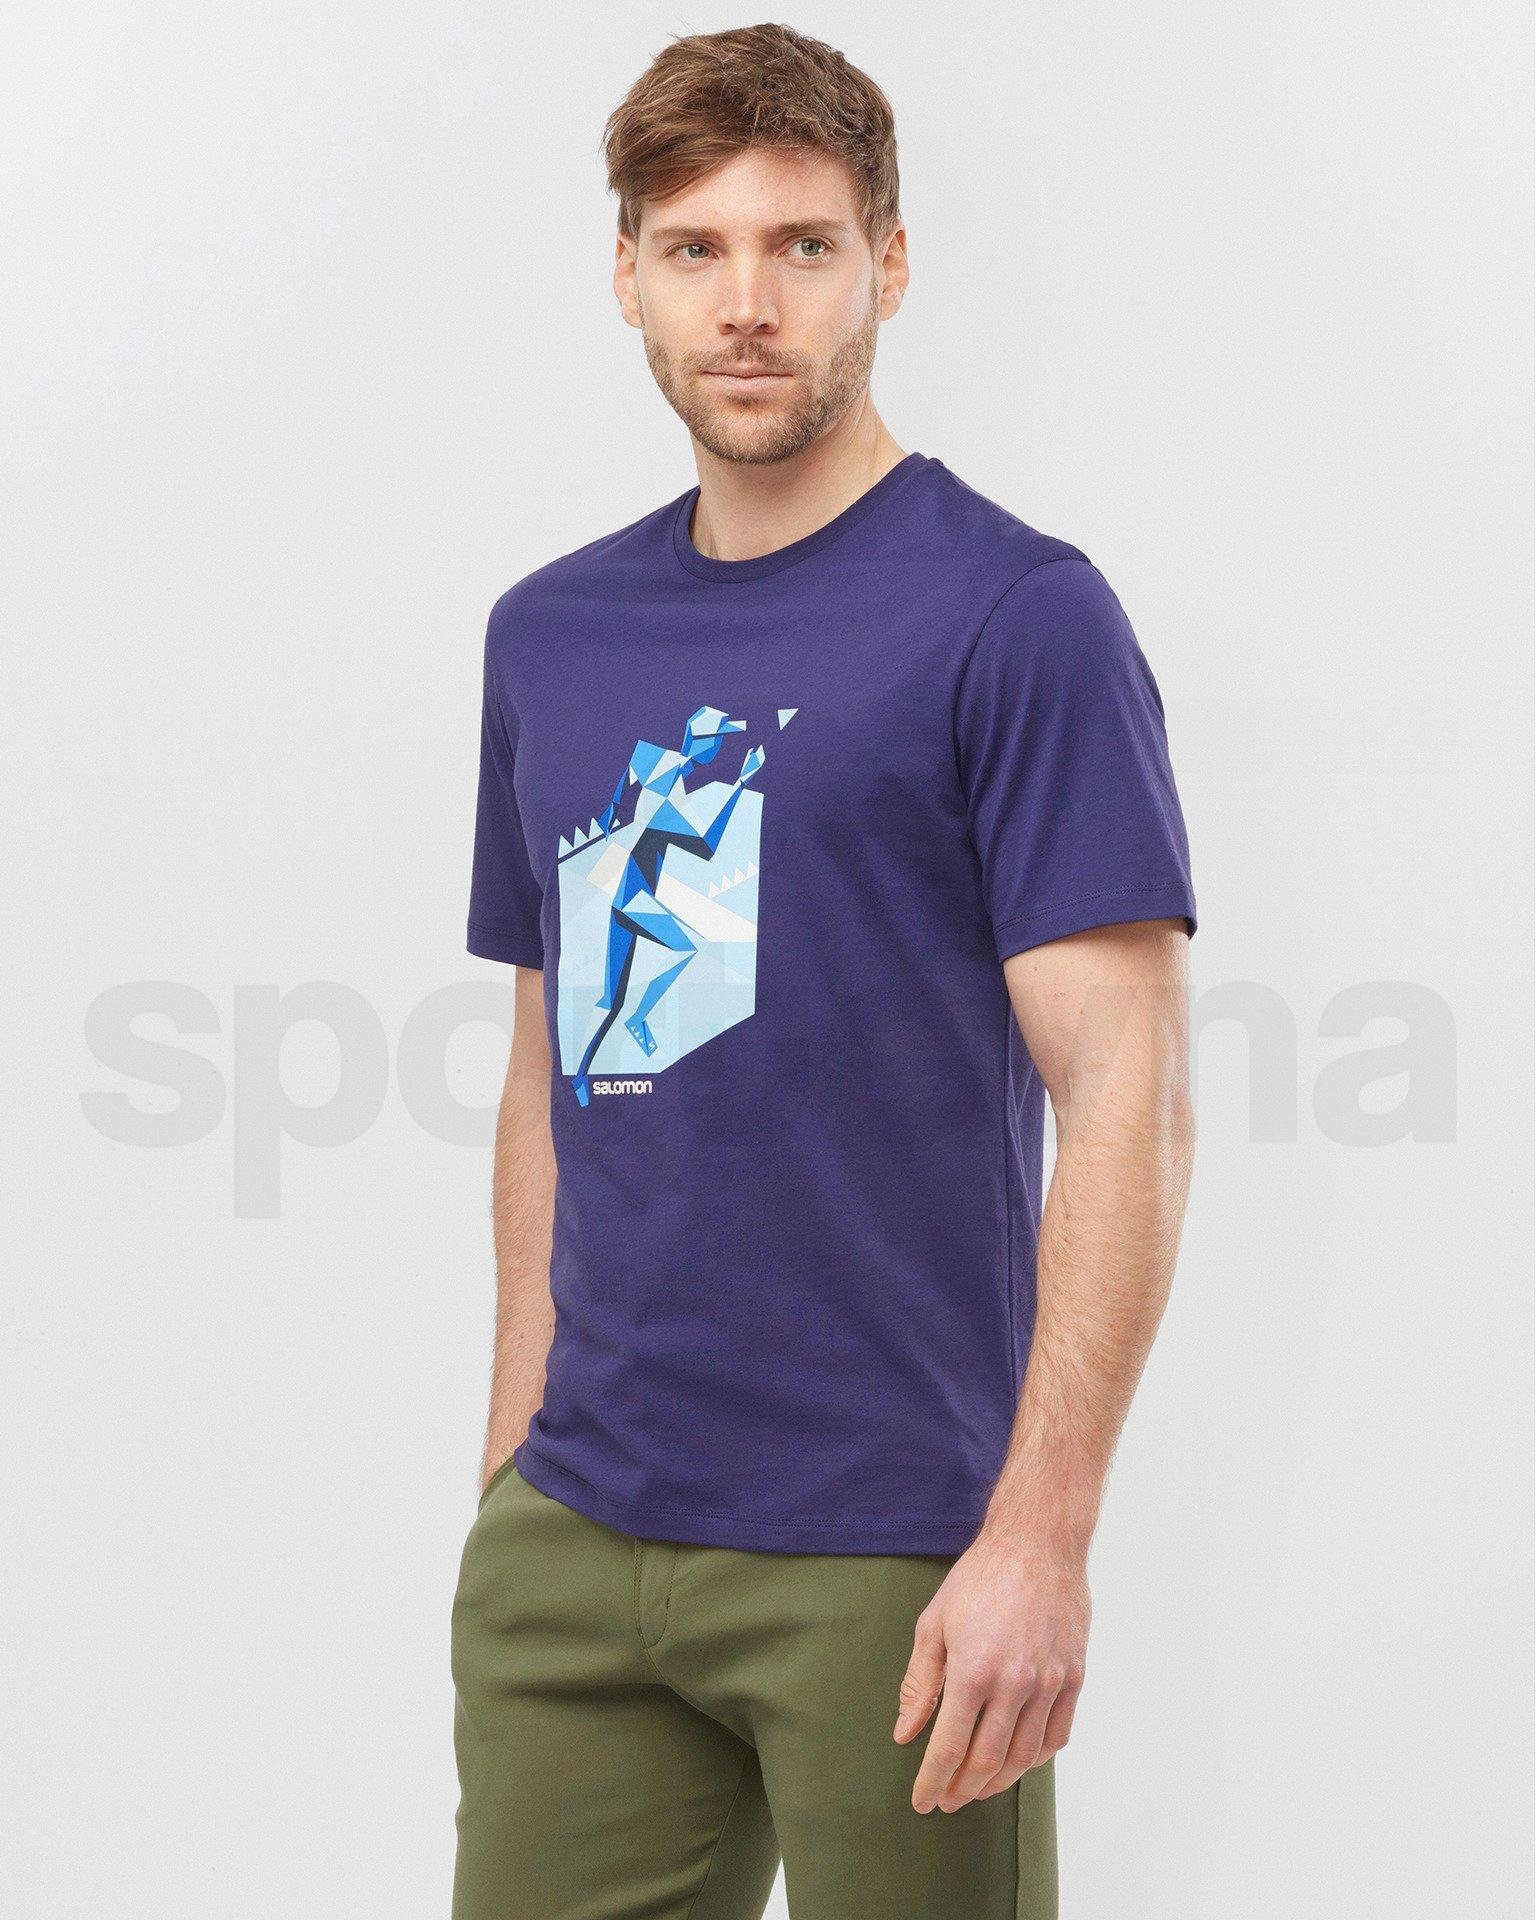 Tričko Salomon OUTLIFE GRAPHIC GEO RUNNER M - tmavě modrá